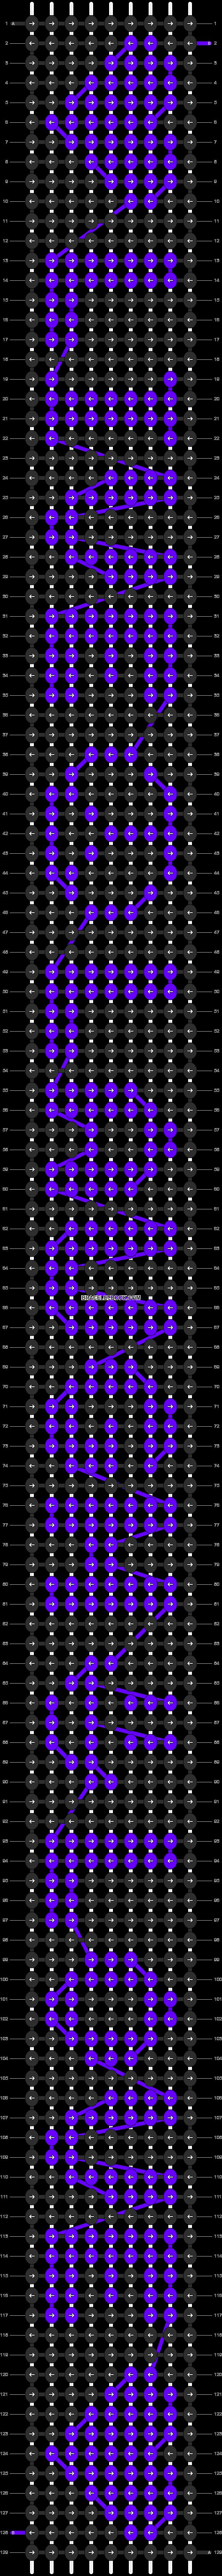 Alpha pattern #5485 pattern